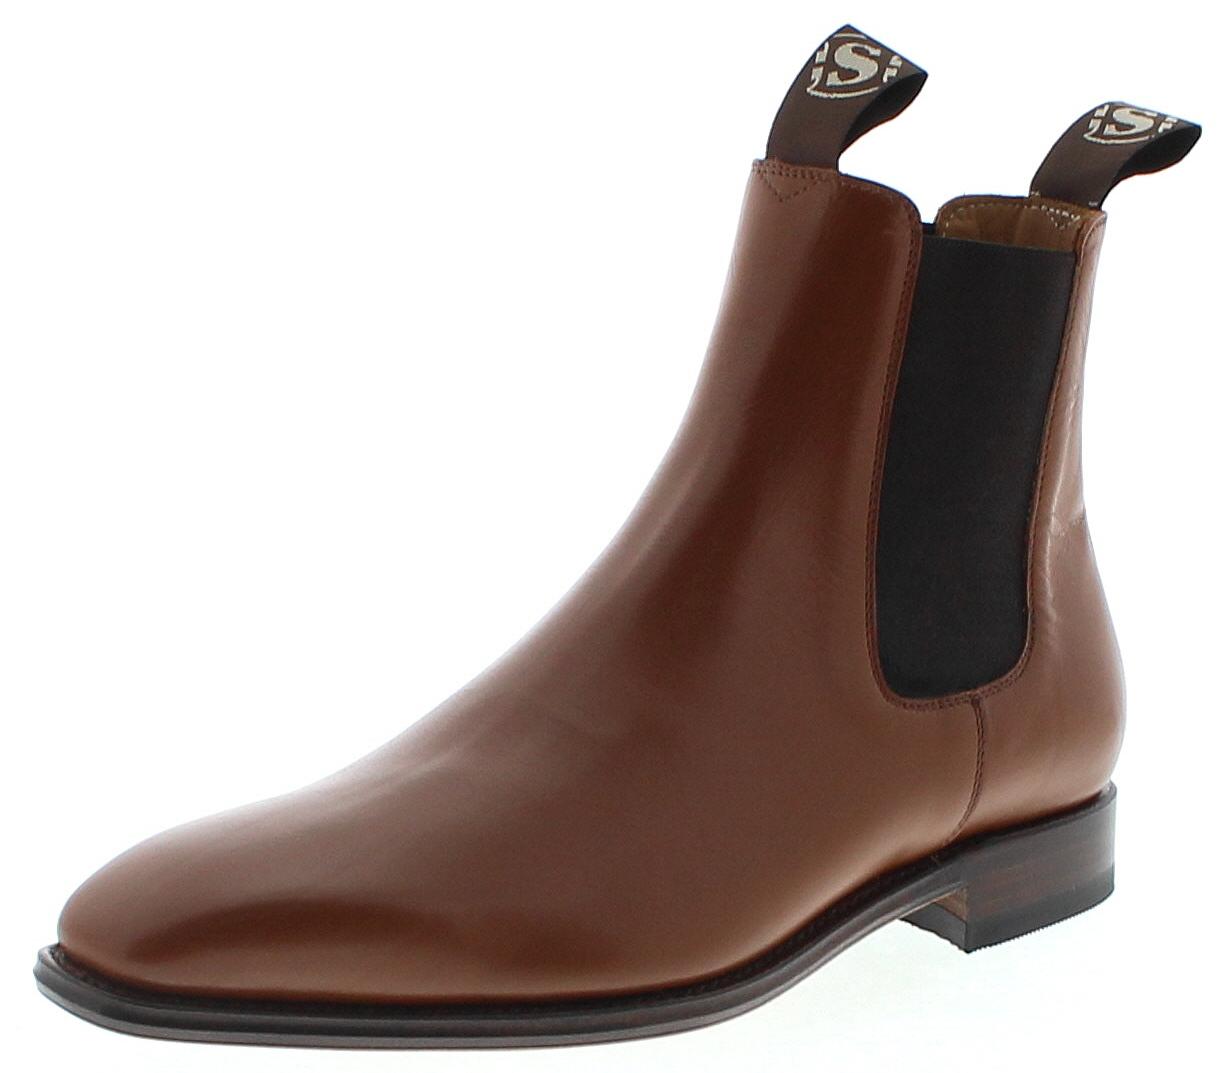 Sendra Boots 5595 Box Jamaica Men's Chelsea boot - brown